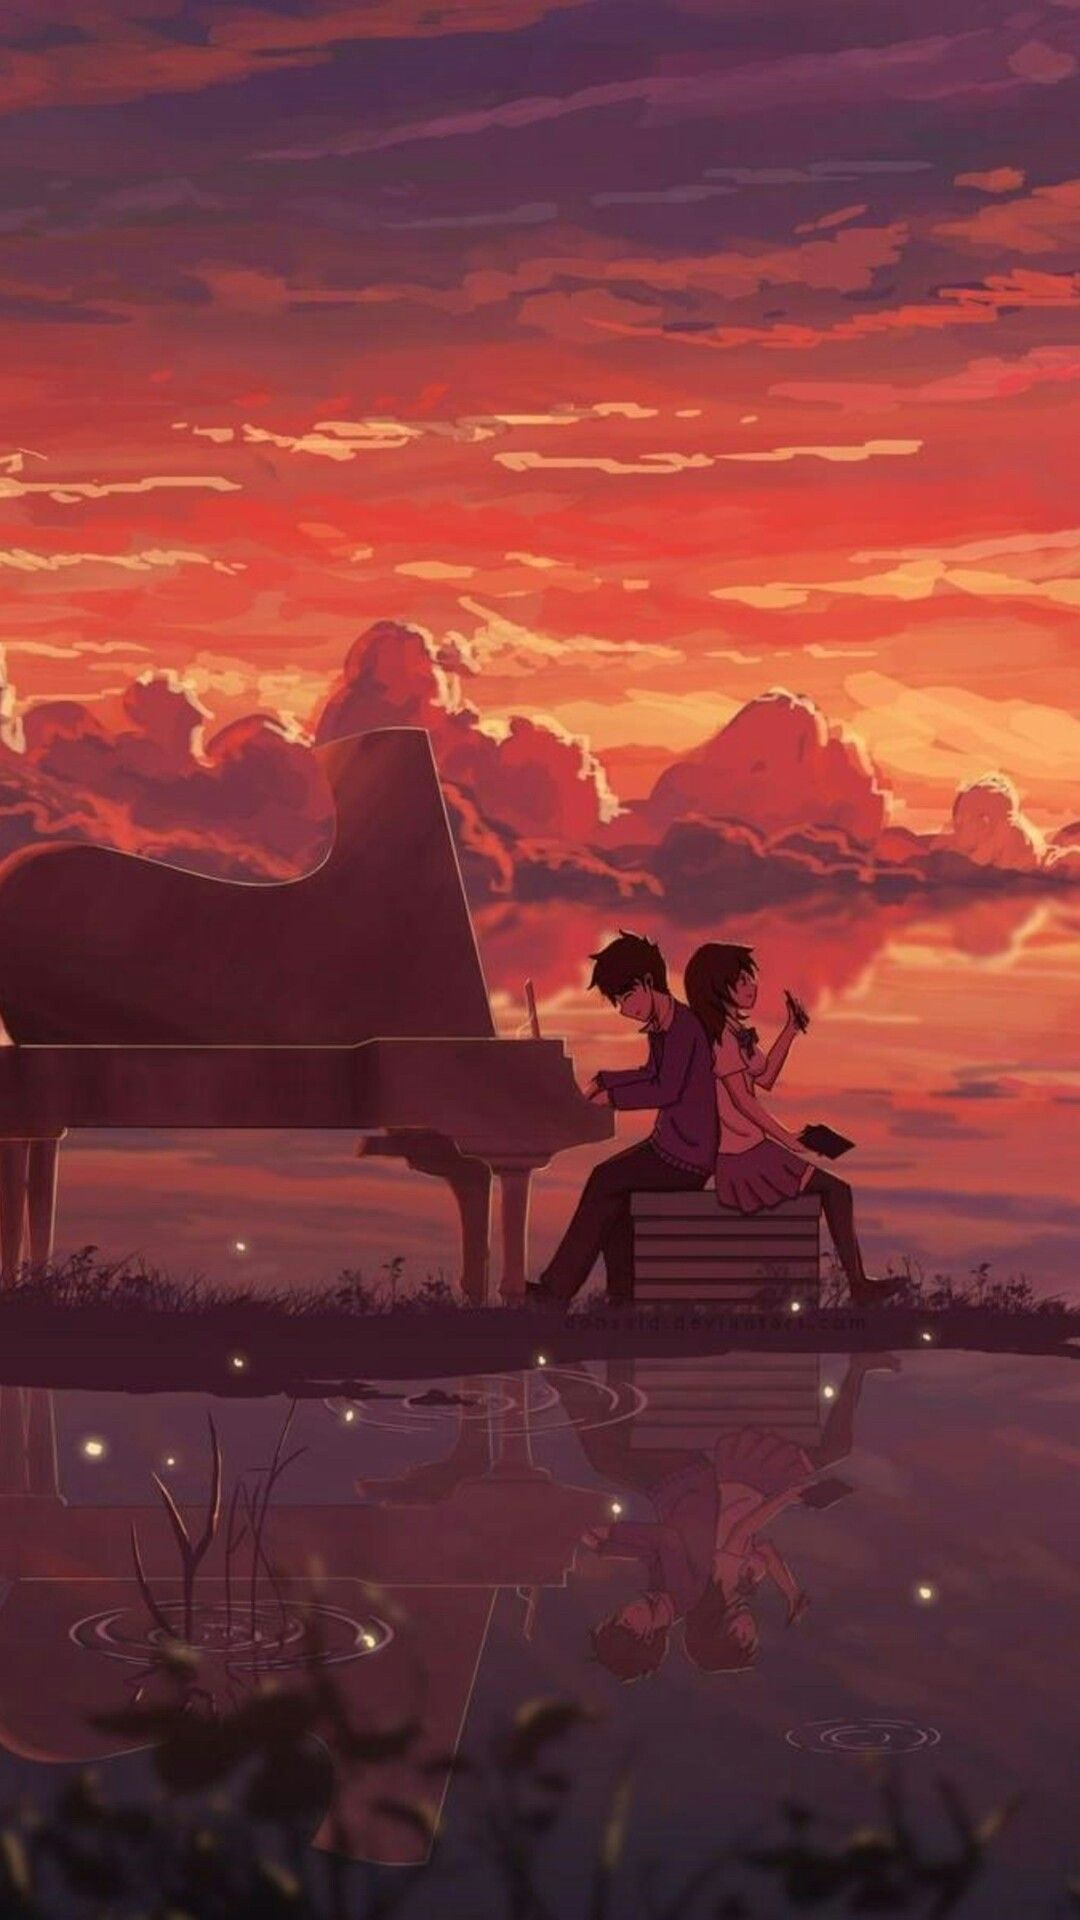 Pin by Monique Garcia on Anime Anime scenery, Anime